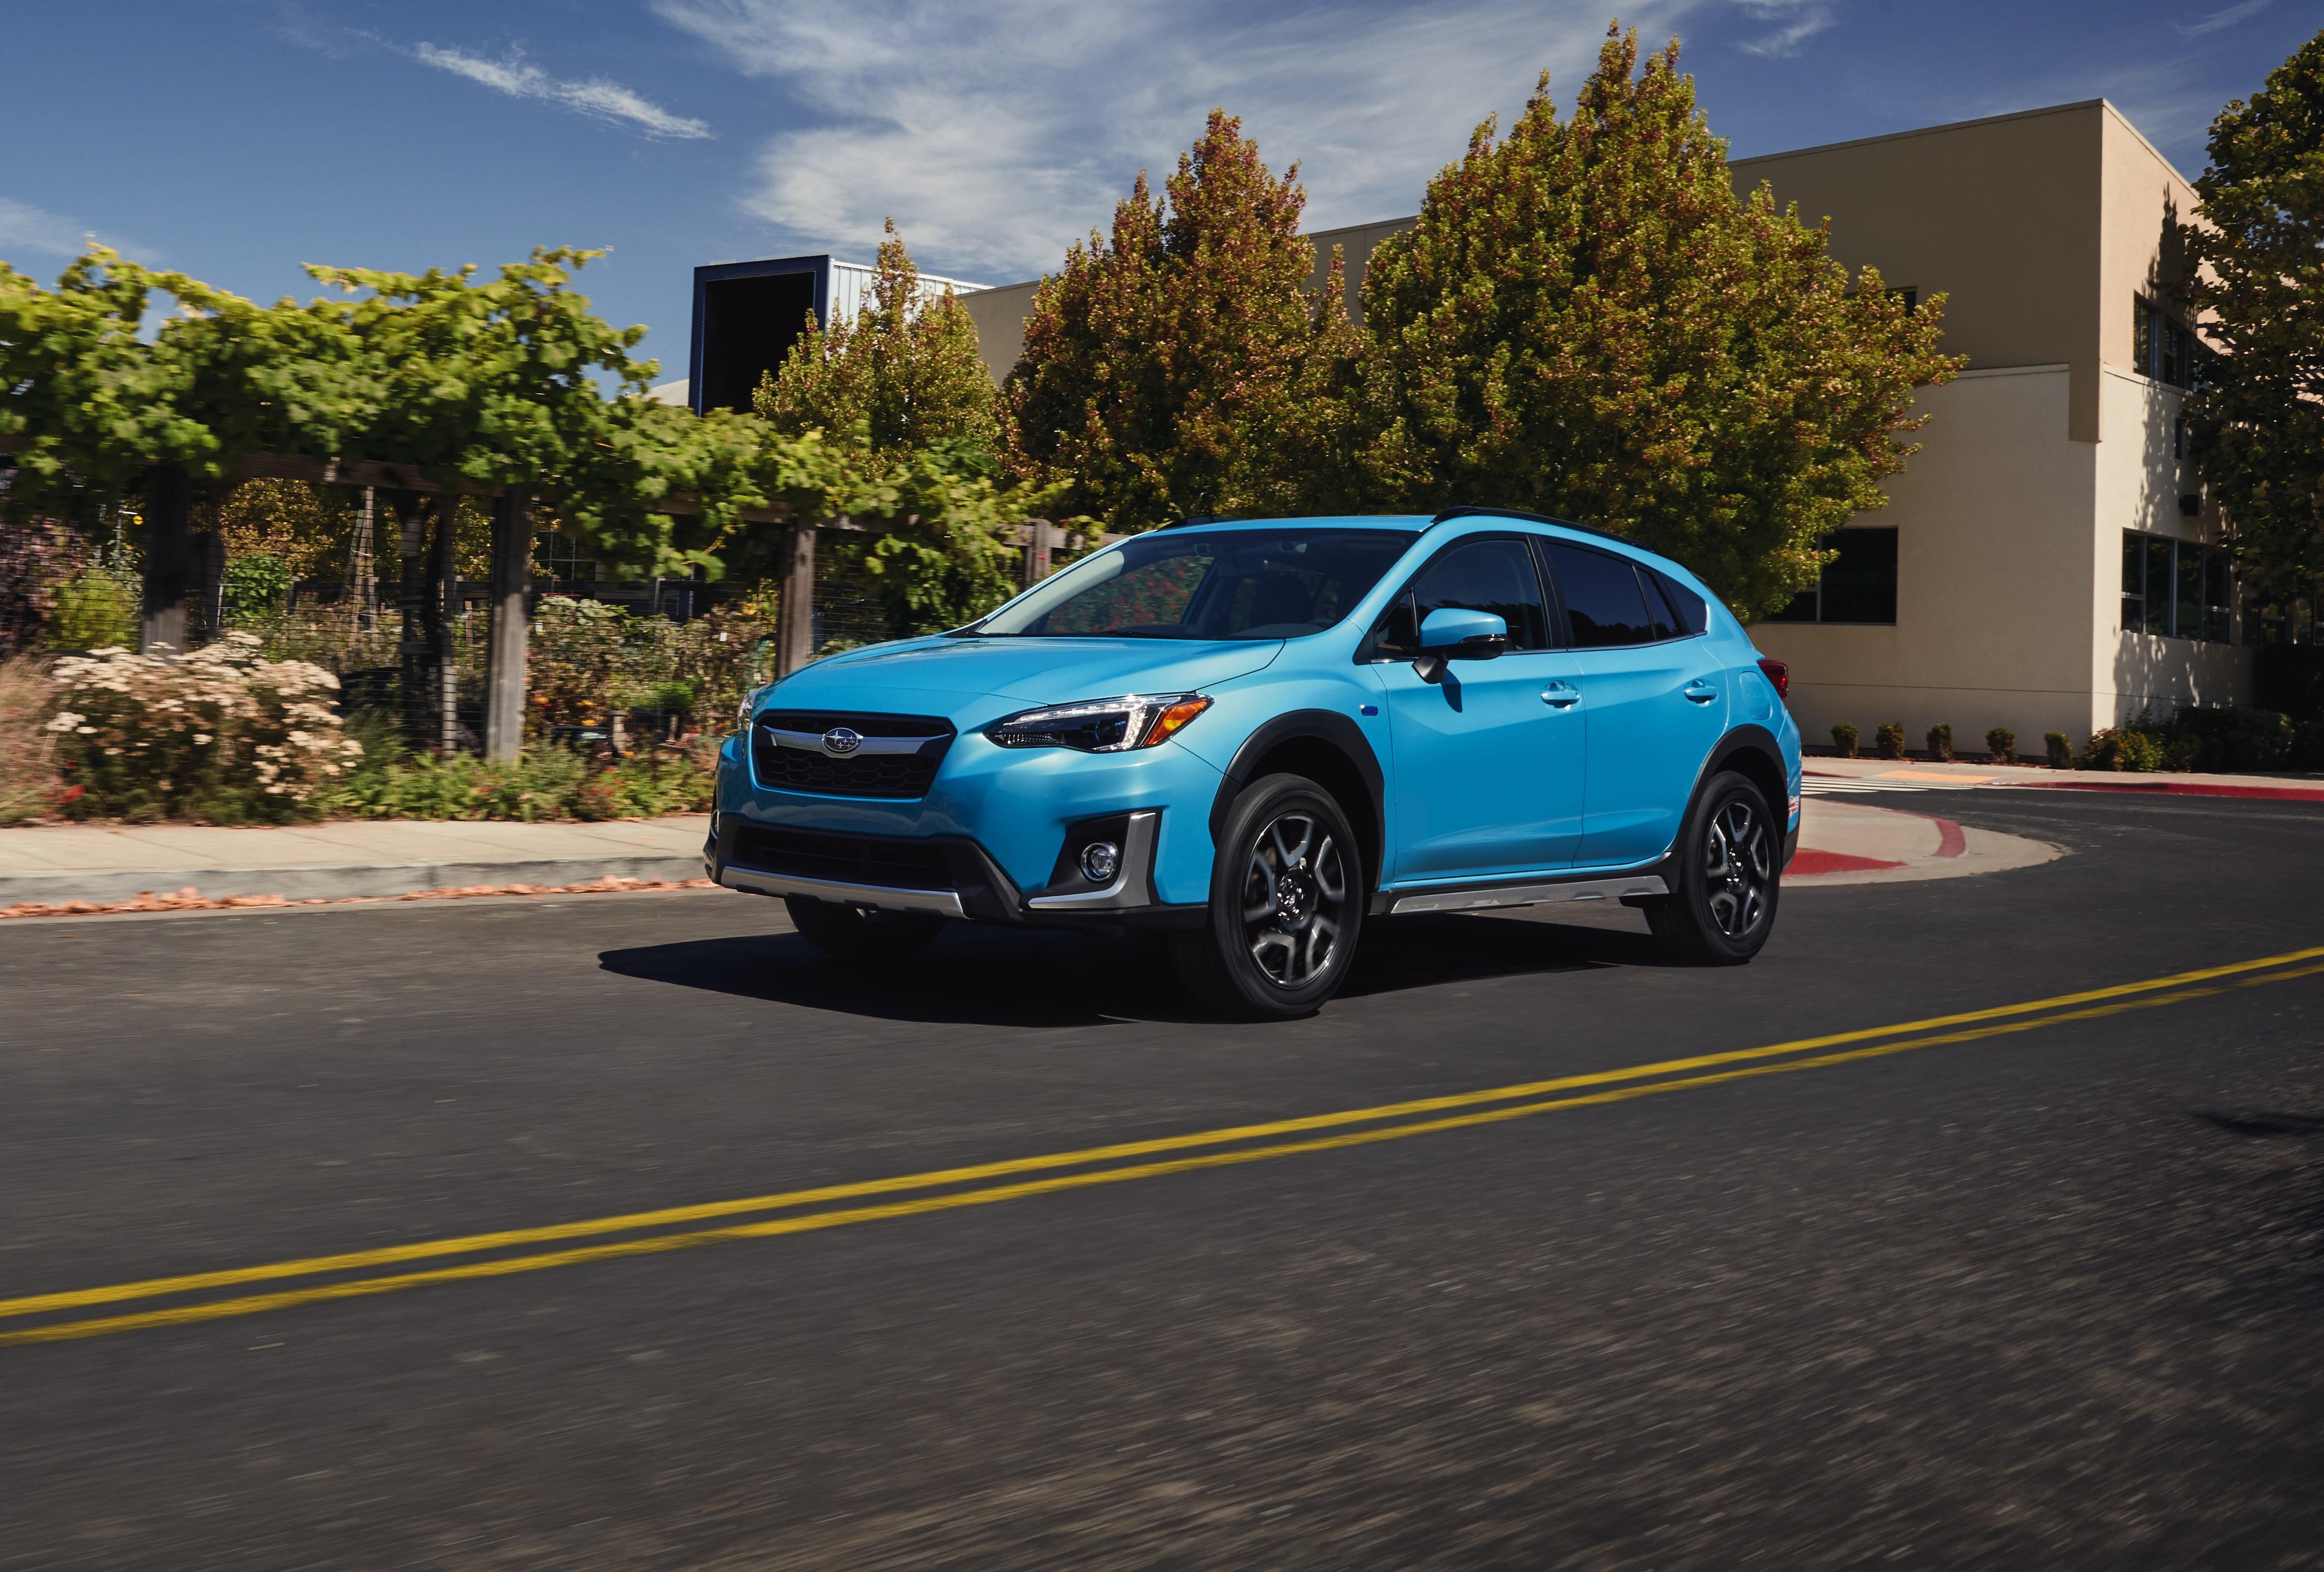 Subaru Prices 2020 Crosstrek And Crosstrek Hybrid The Intelligent Driver